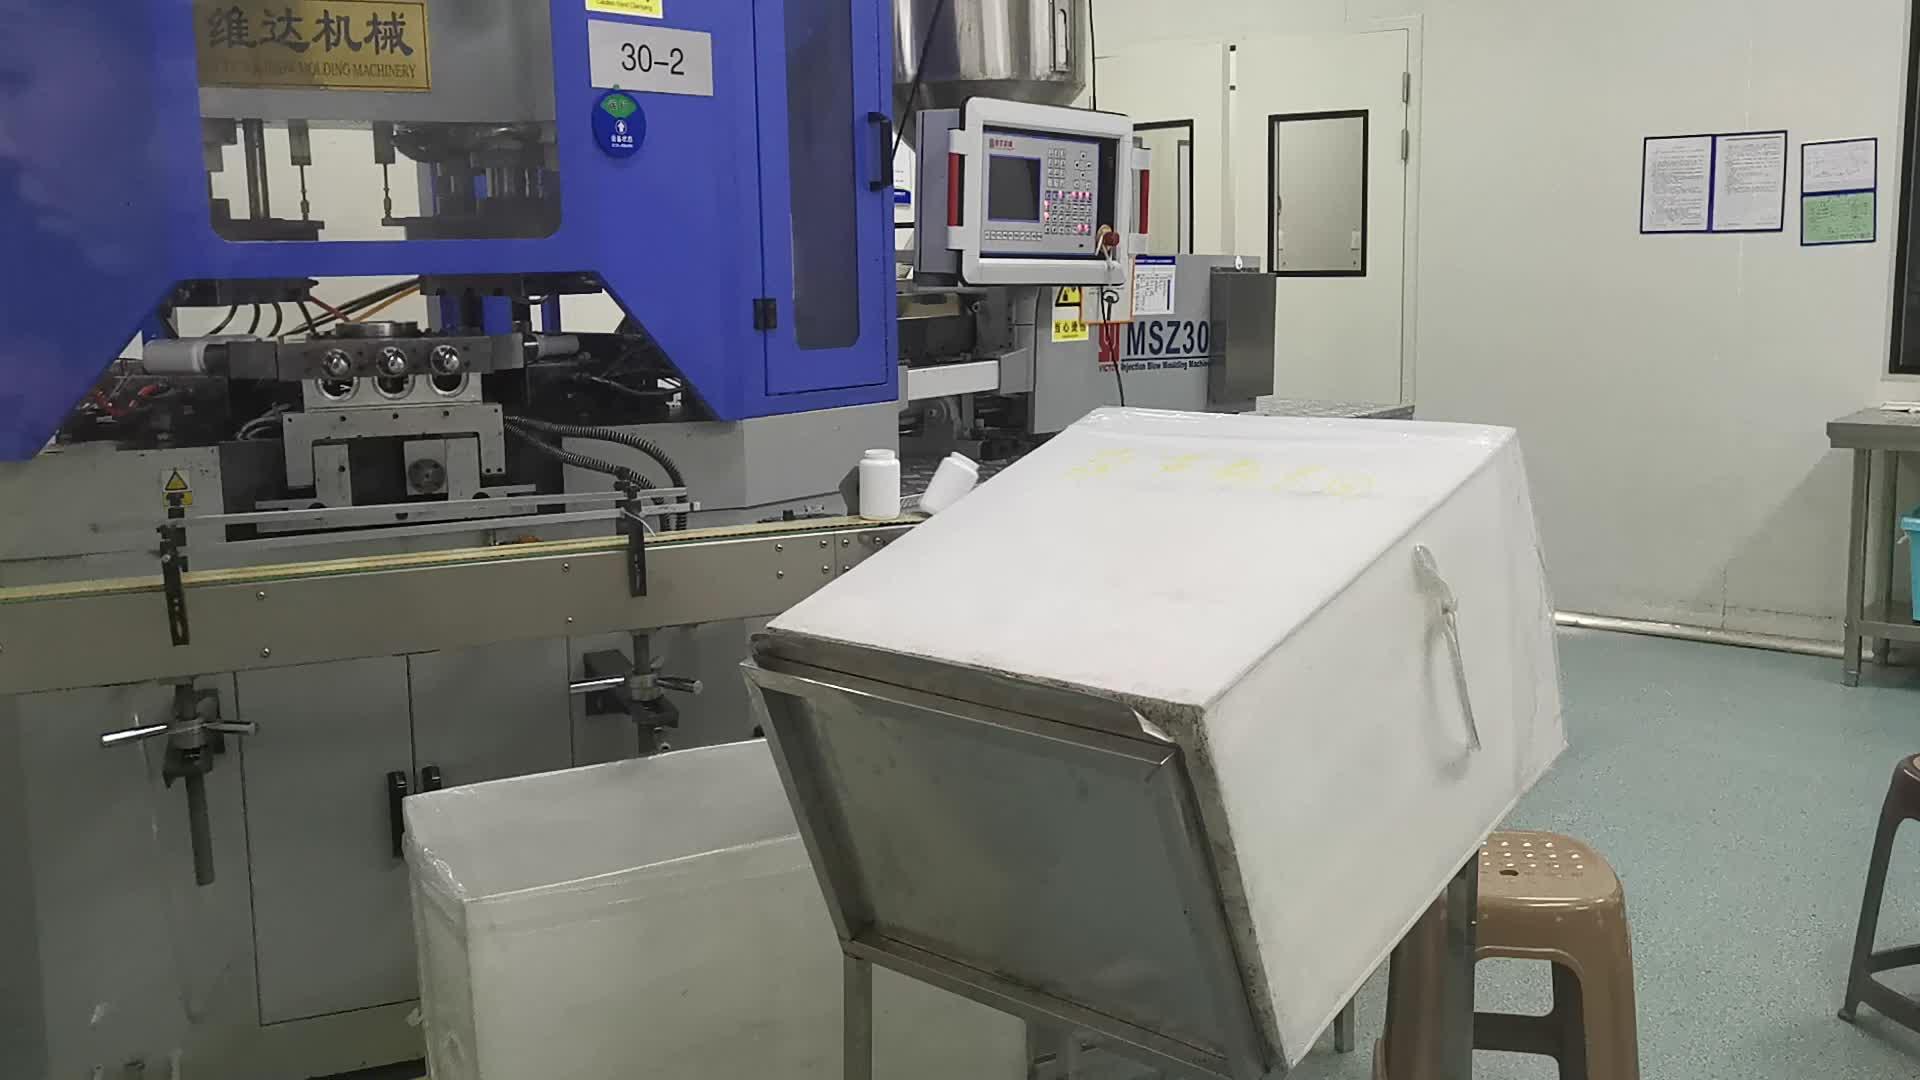 100 Ml 250 Ml Tutup Putih Plastik PET Farmasi Pil Botol